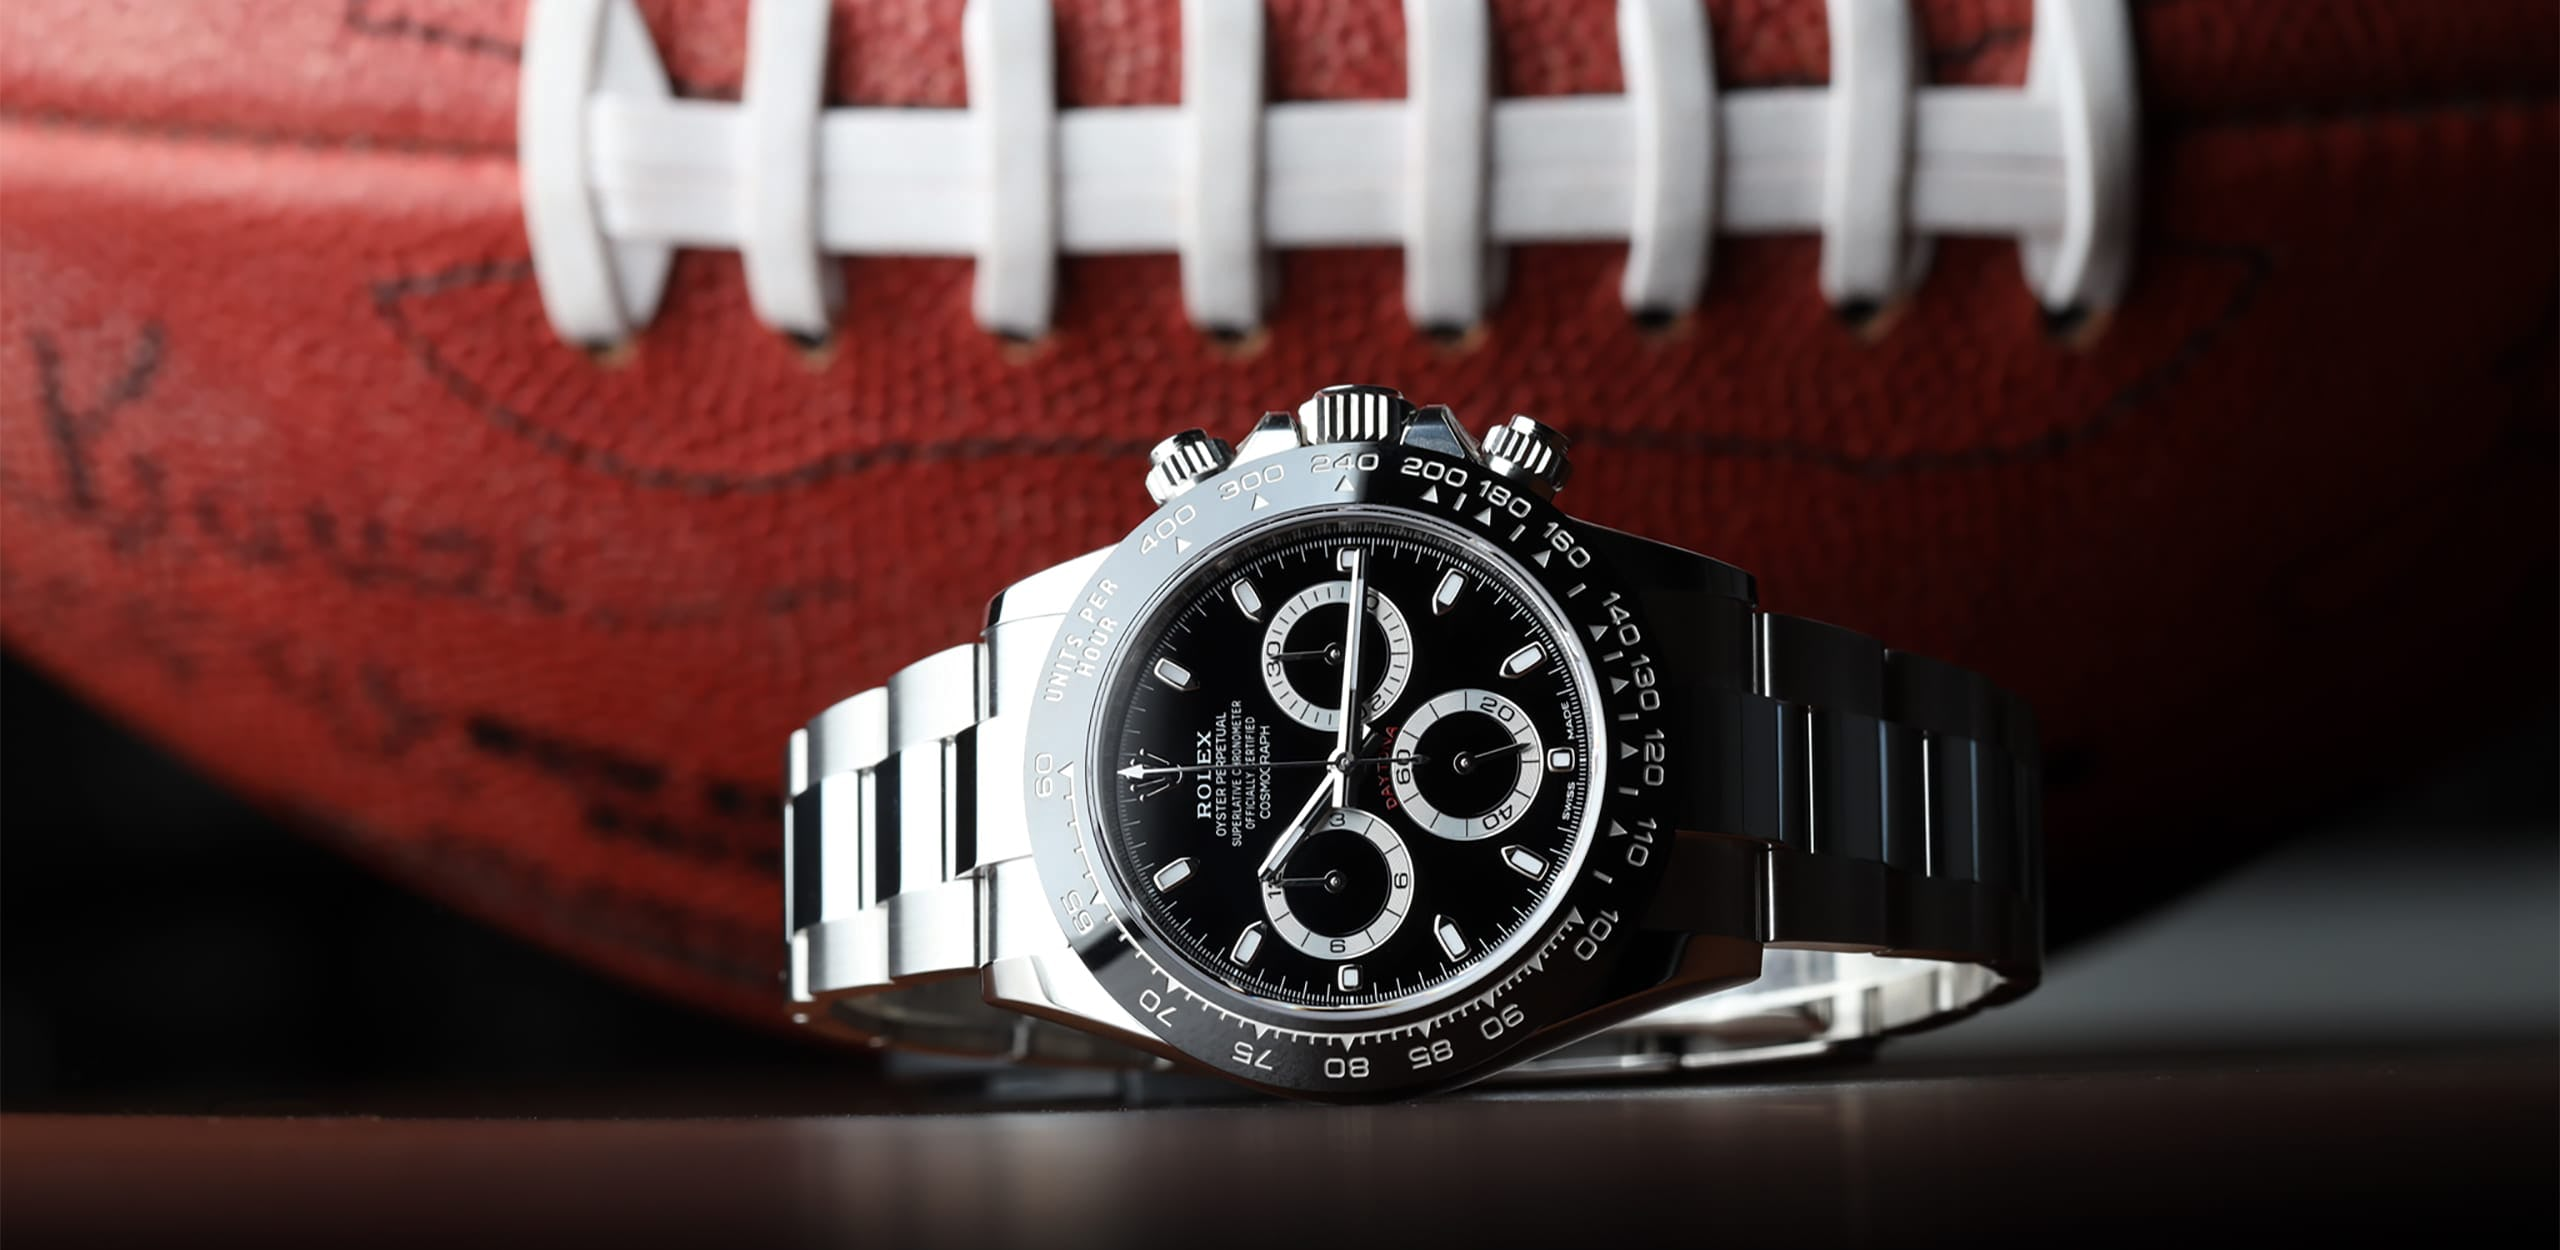 WatchBox Joins Super Bowl Champion Mitchell Schwartz to Support the ALL IN Challenge